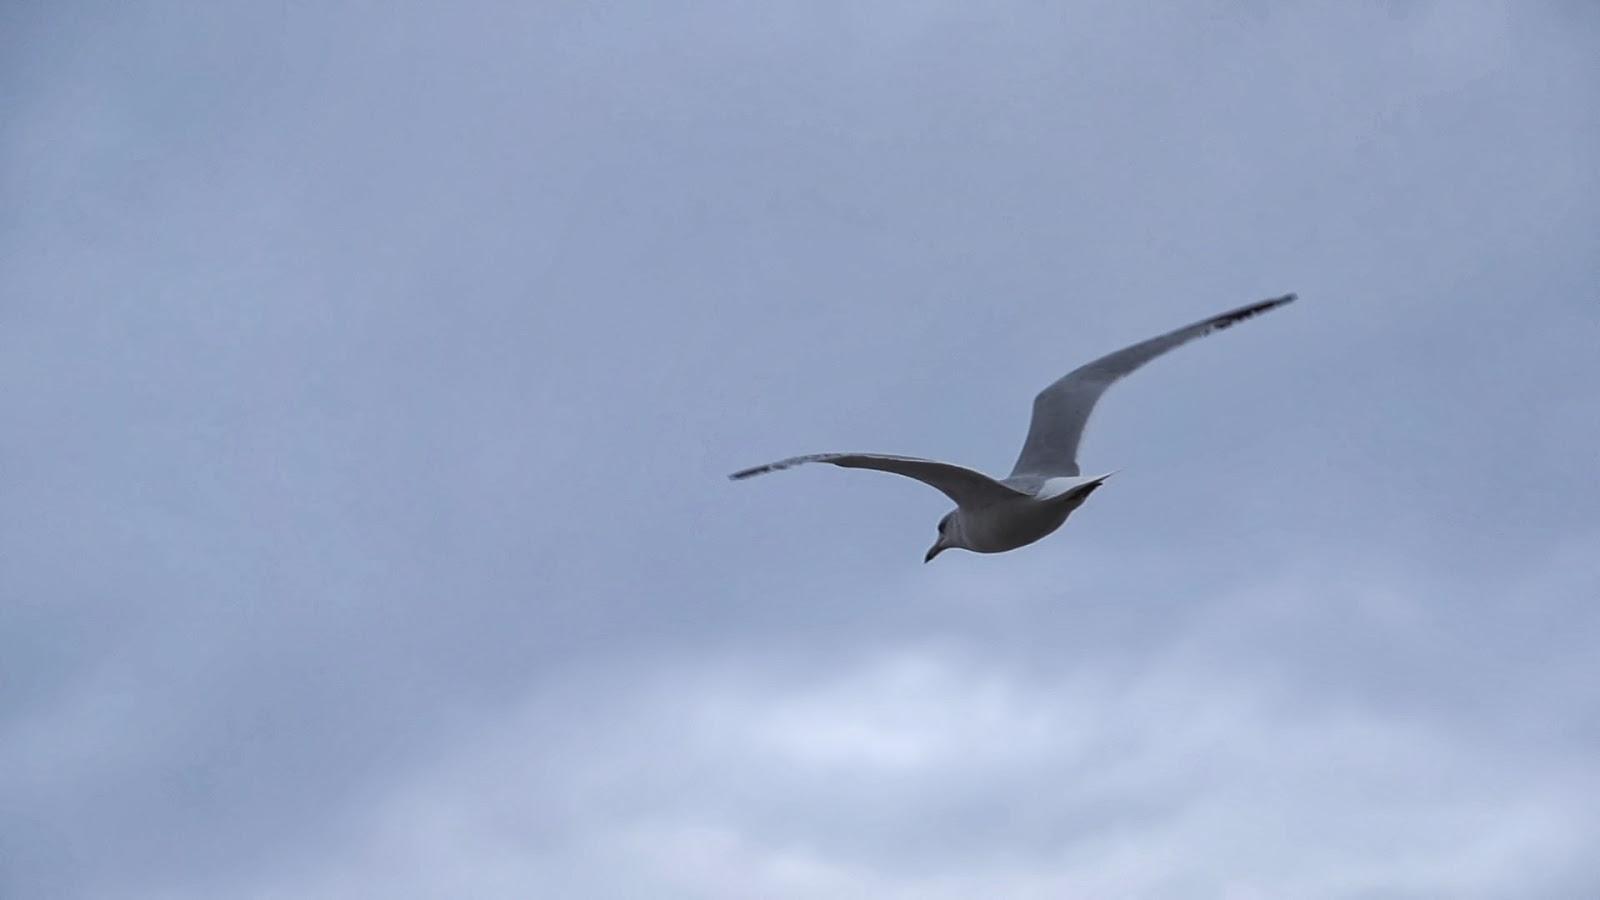 Seagull Flying Alt Medium